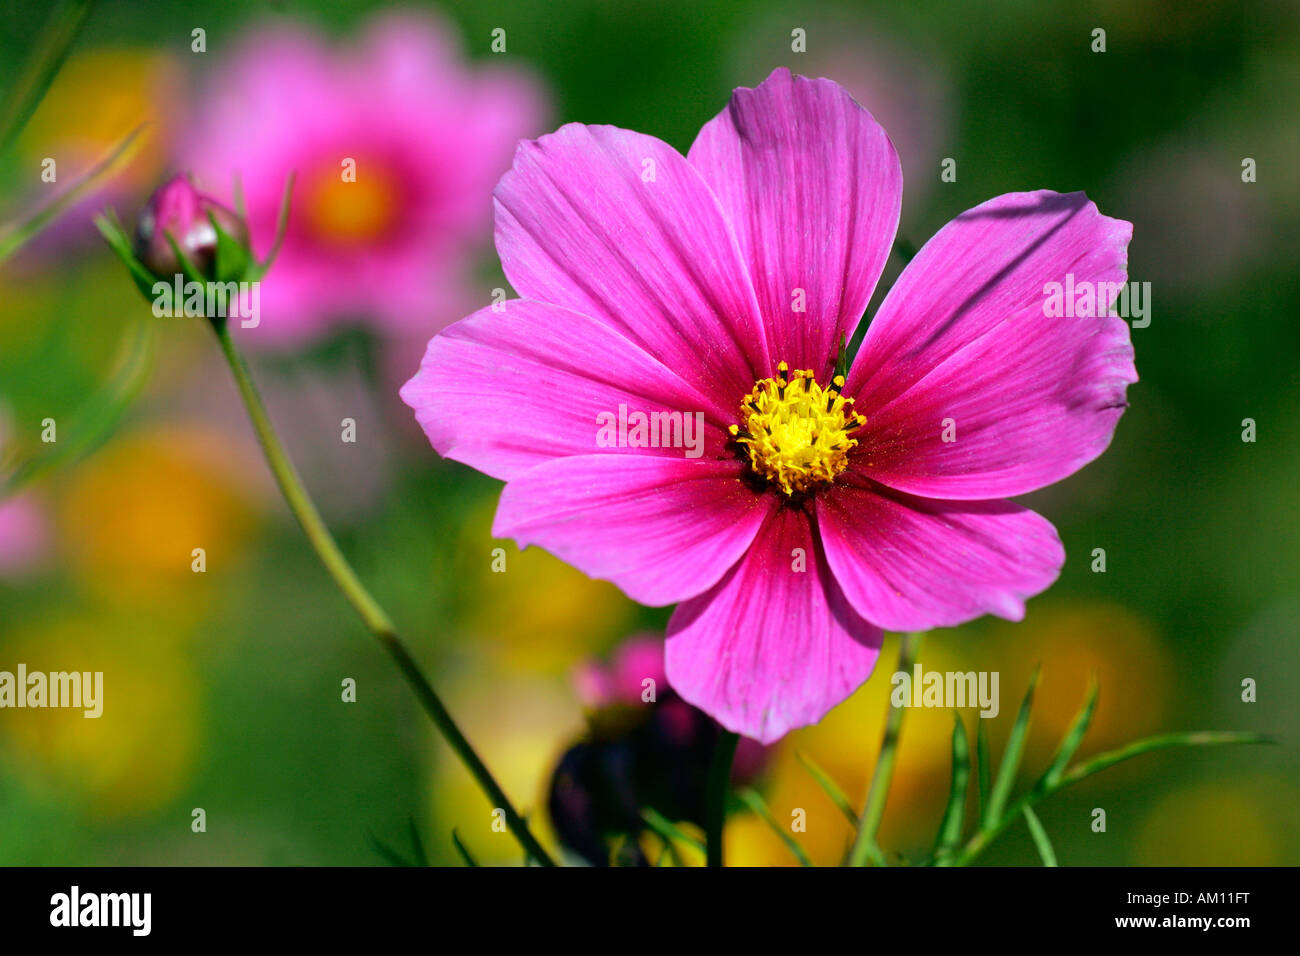 Flowering Mexican Aster - Garden Cosmos (Cosmos bipinnatus) - Stock Image